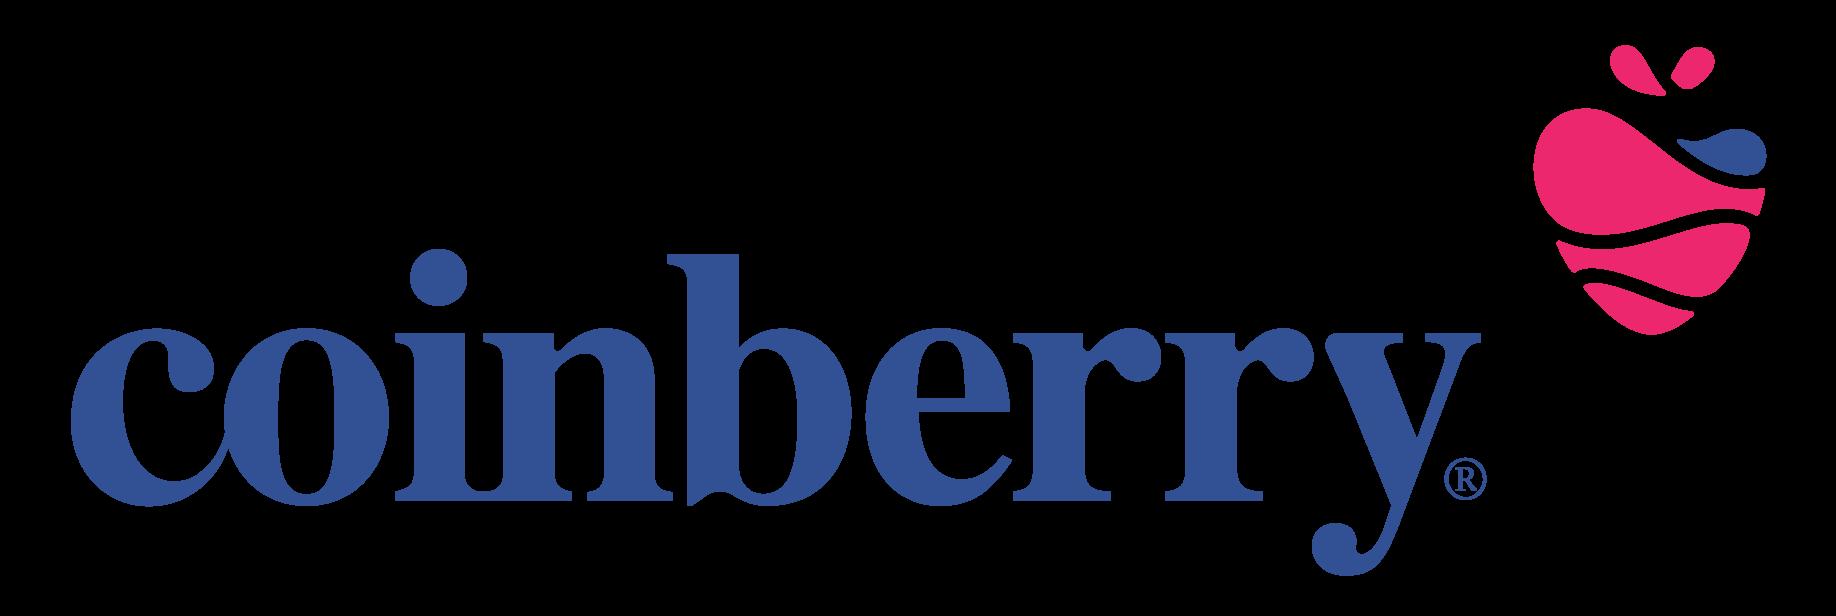 Coinberry logo